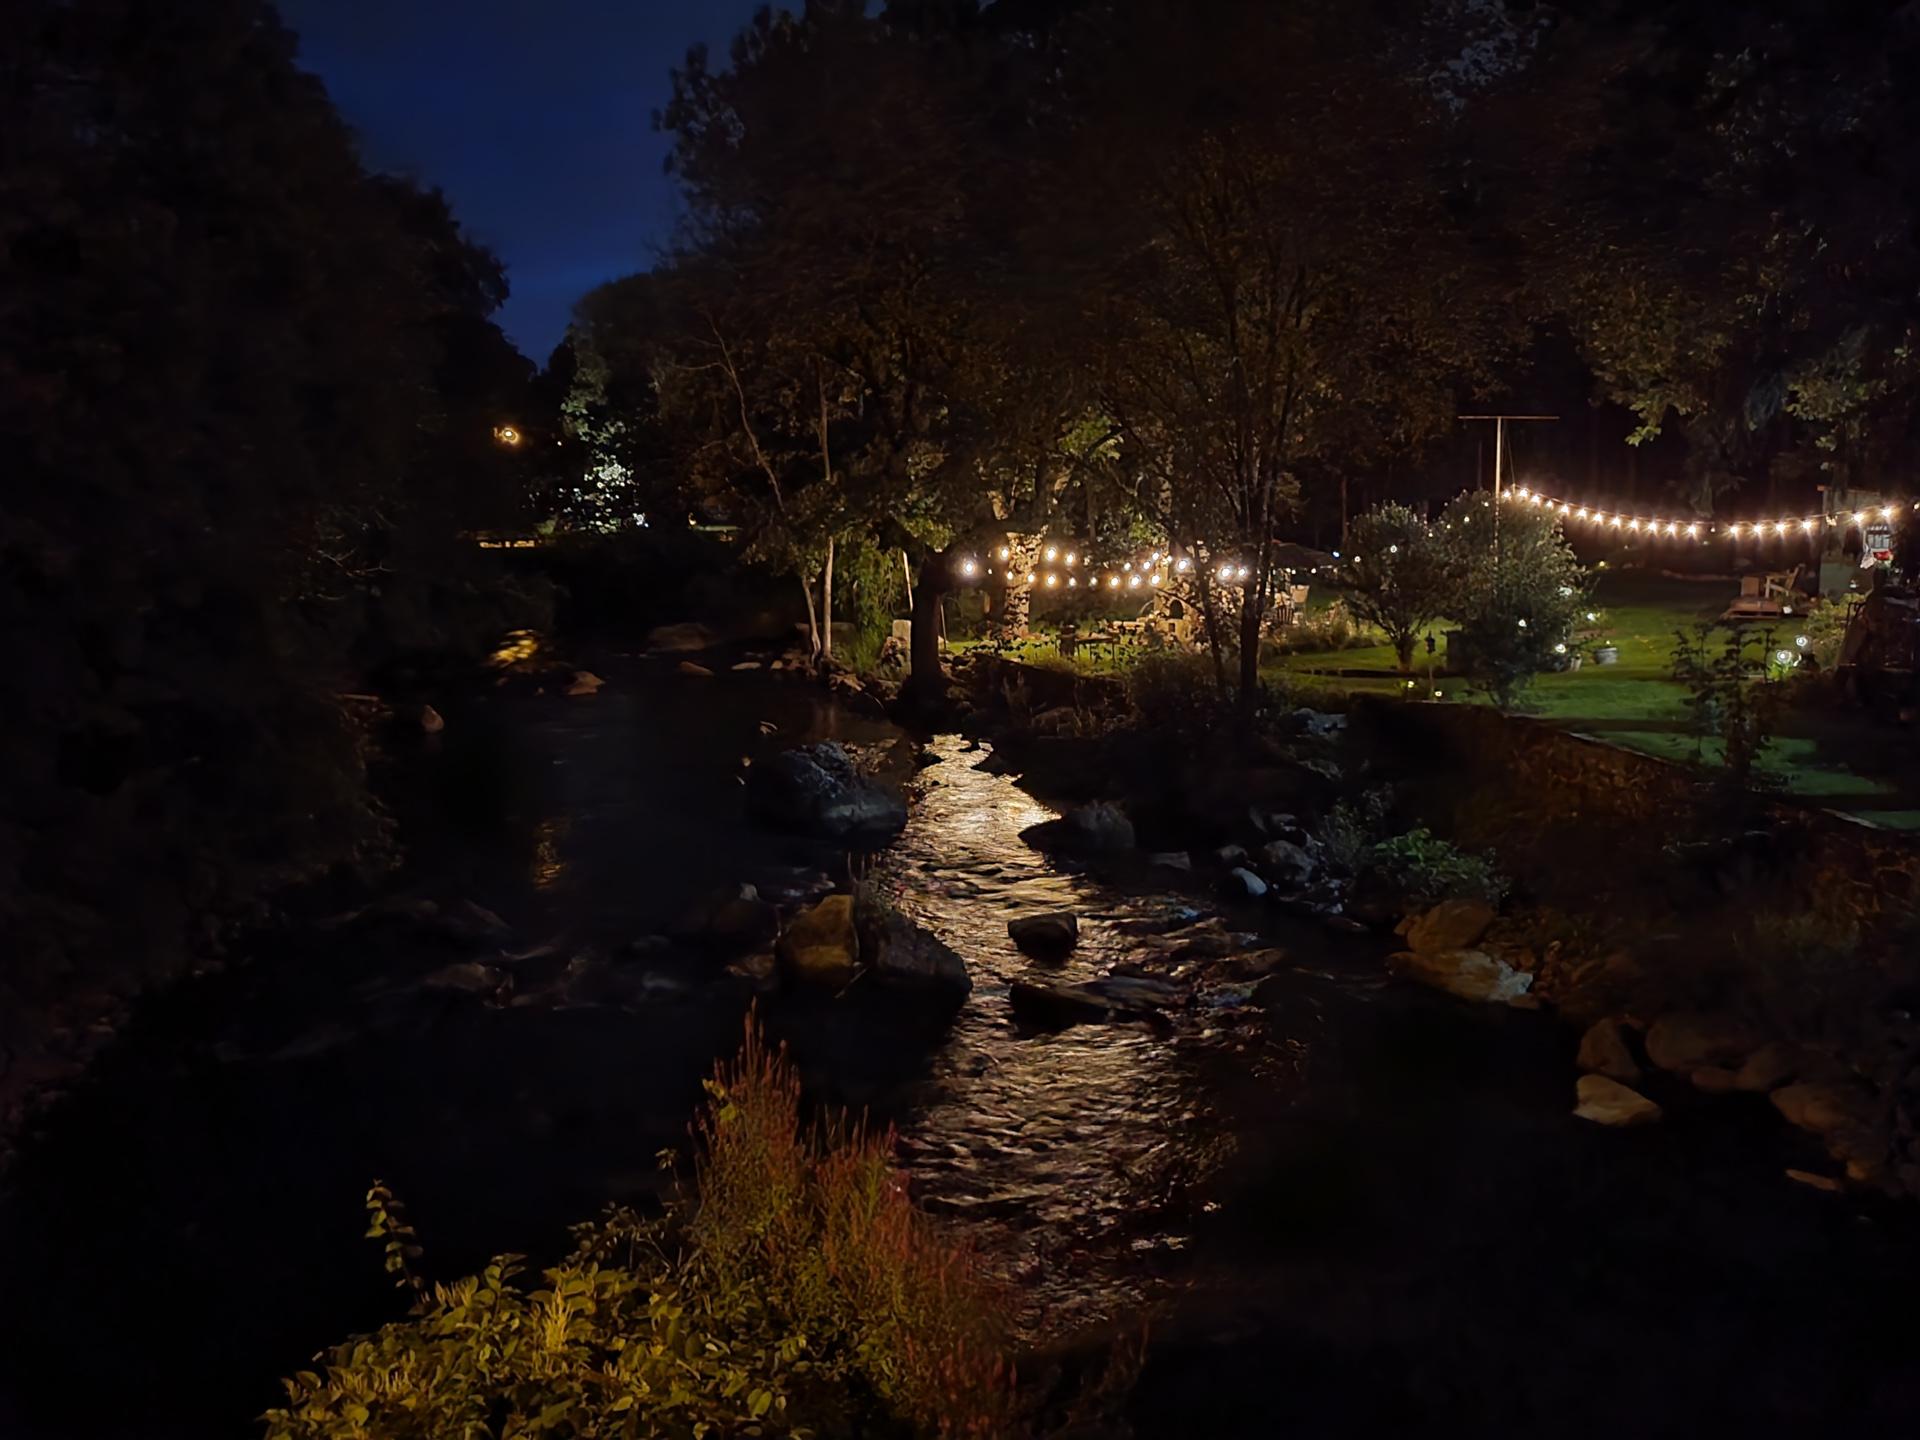 Samsung Galaxy Z Flip 3 photo sample River at night